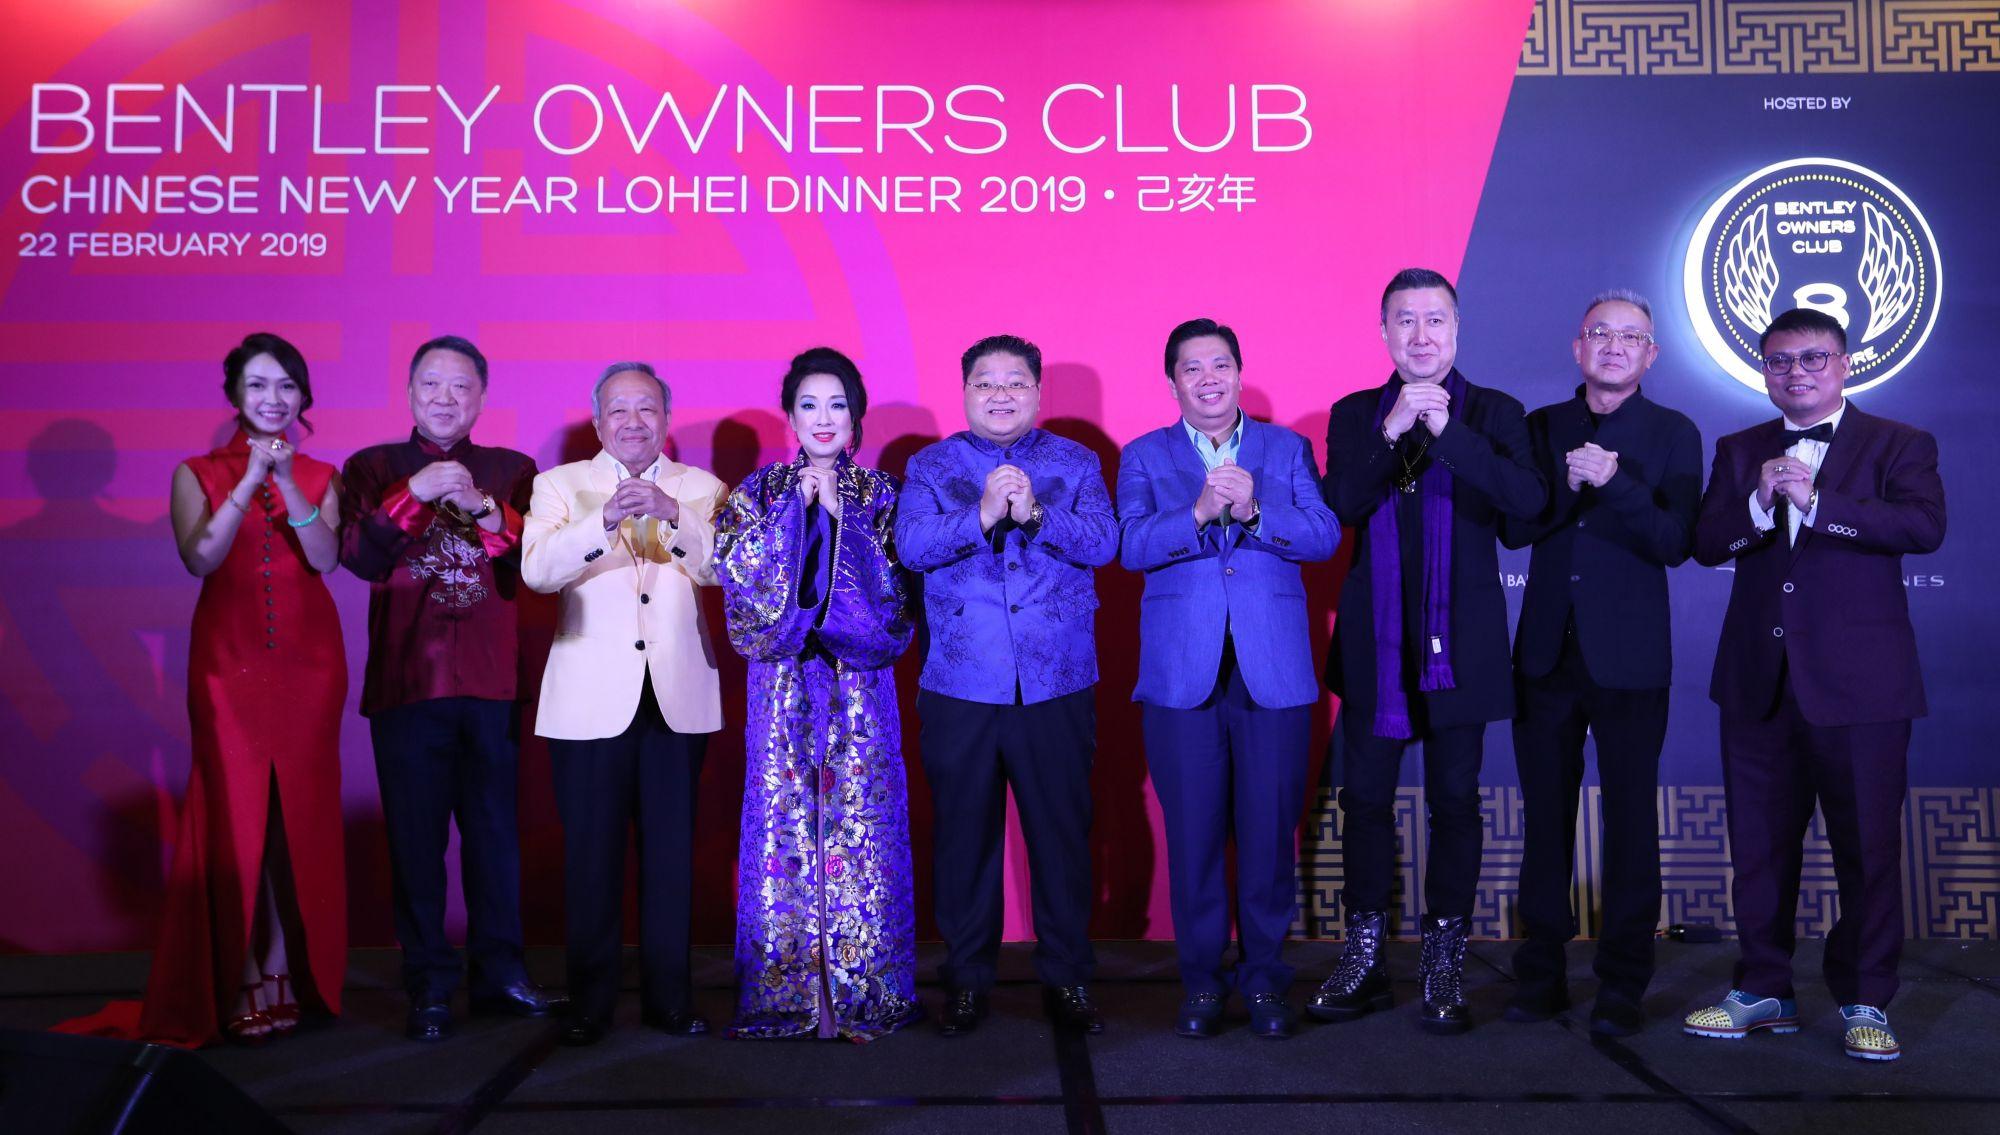 Kelly Keak, Leonard Kwan, CT Koh, Elaine Teh, Andy Kuek, Neo Kah Kiat, Jeffrey Piak, Eddy Quek, Francis Ong